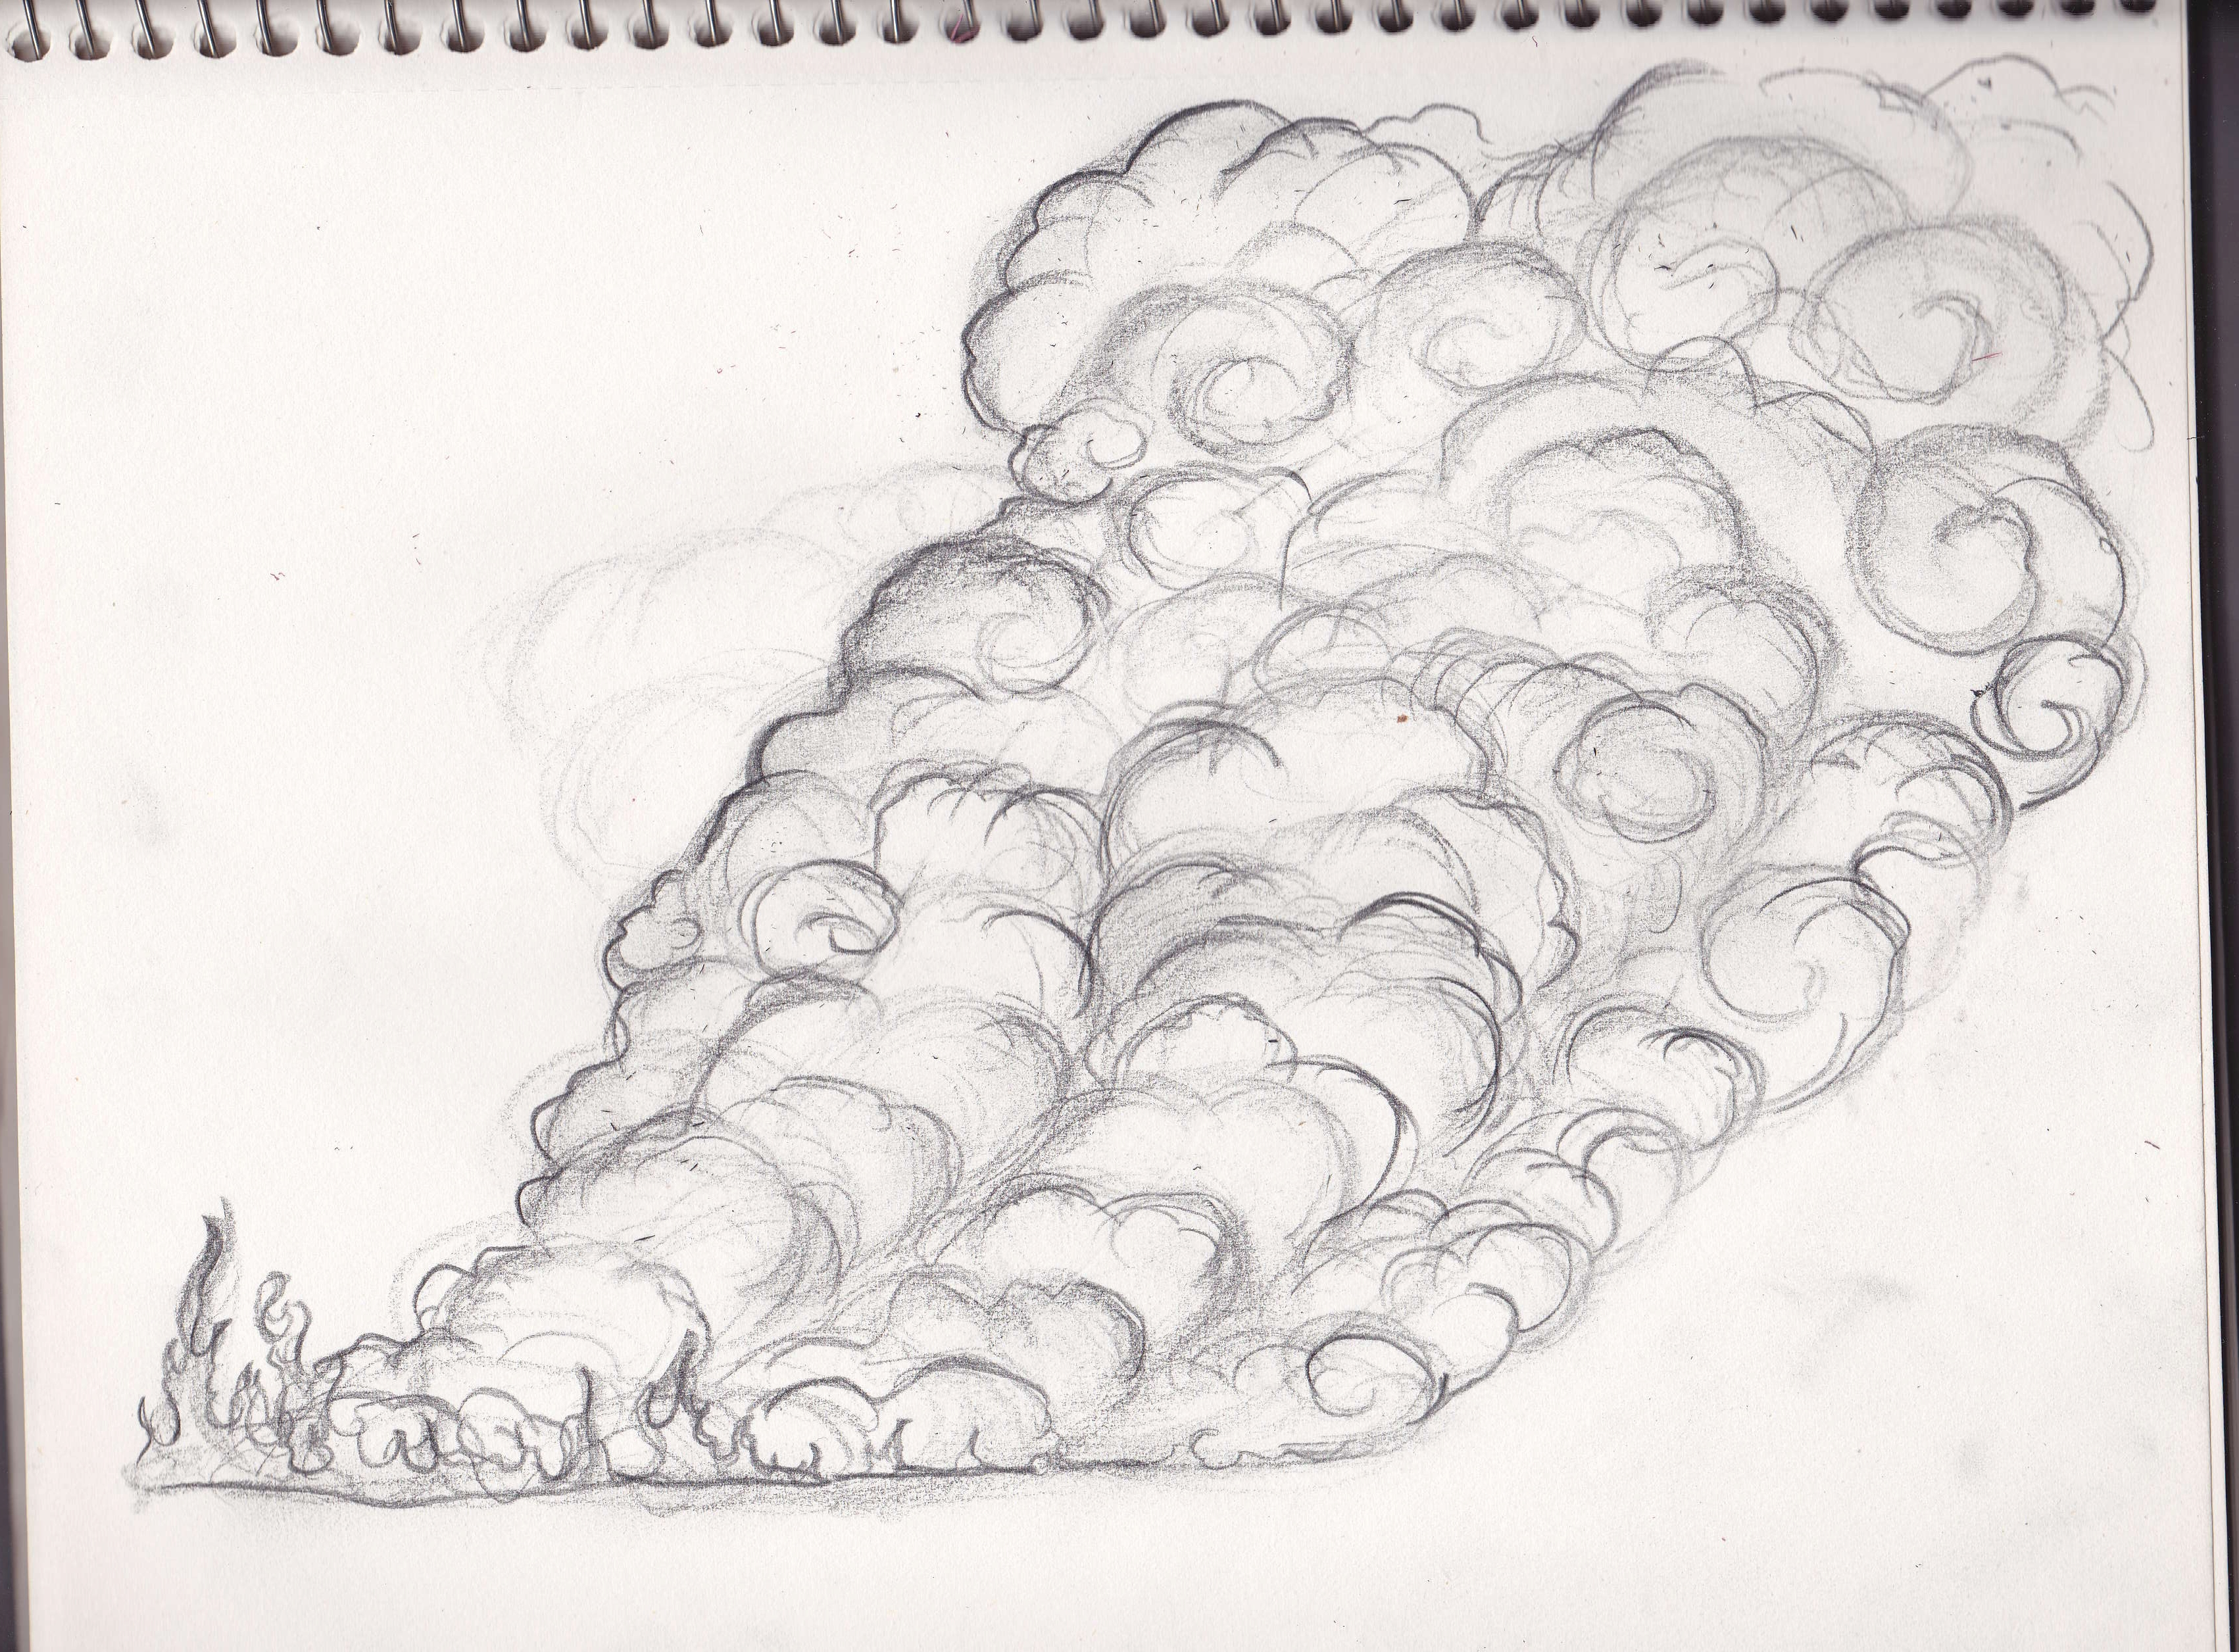 Portfolio Mulan EFX Drawings Smoke - Polyvore